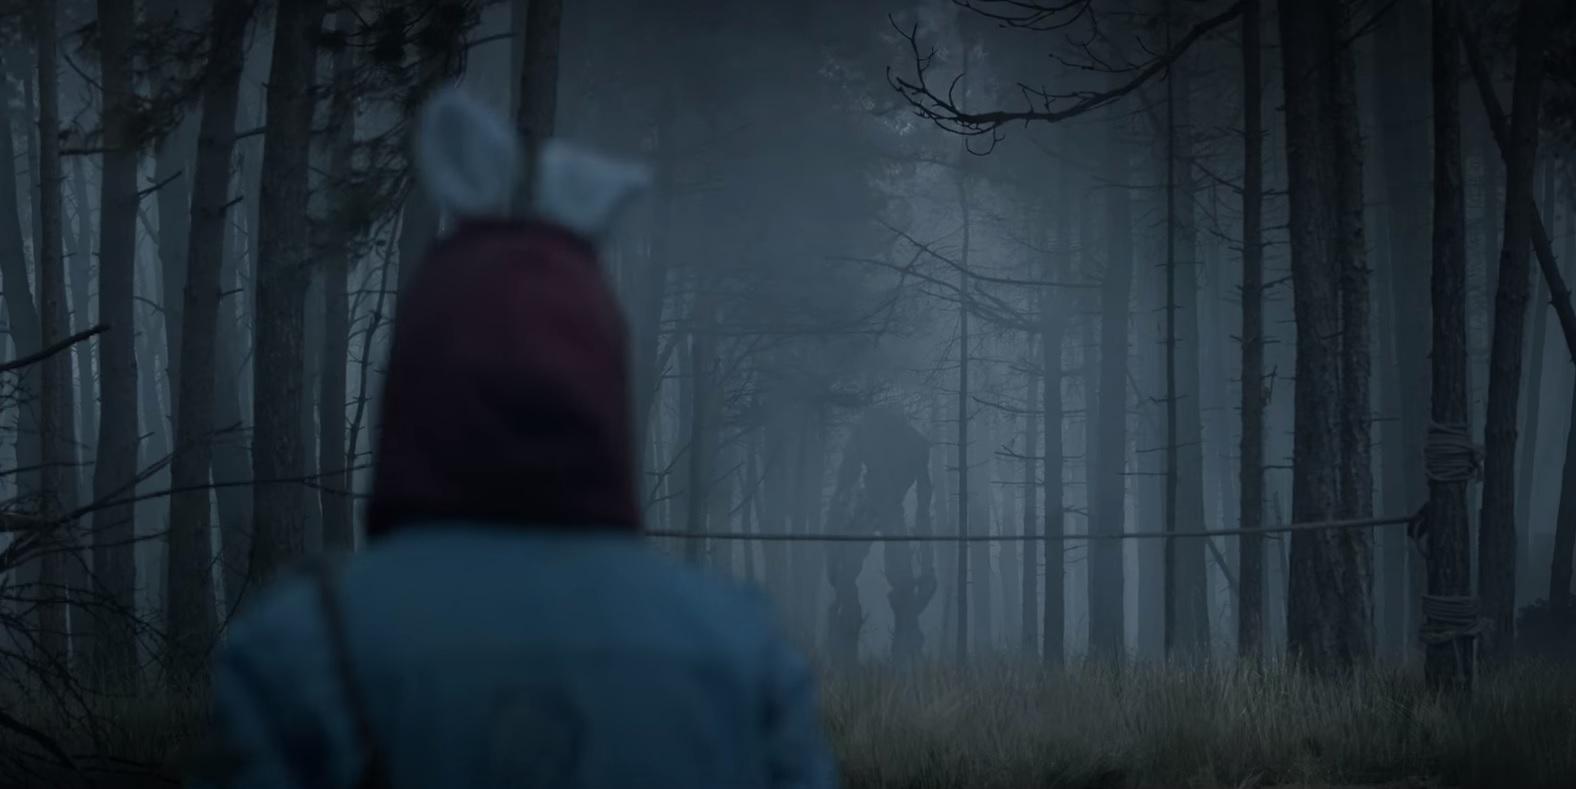 Trailer] One Little Girl Battles Massive Monsters in 'I Kill Giants' -  Bloody Disgusting